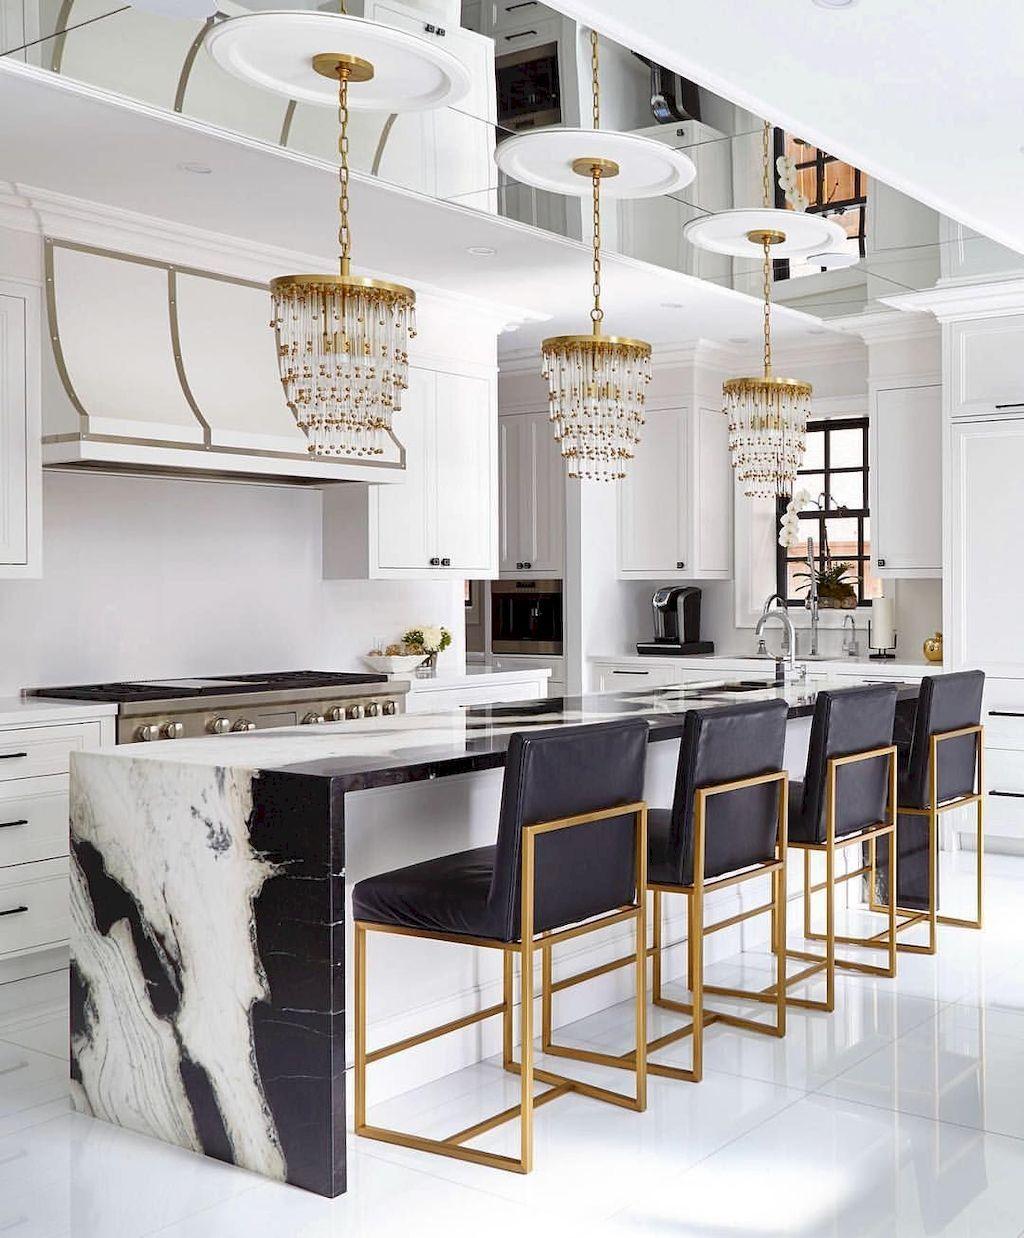 30+ Awesome Luxury Kitchen Design Ideas